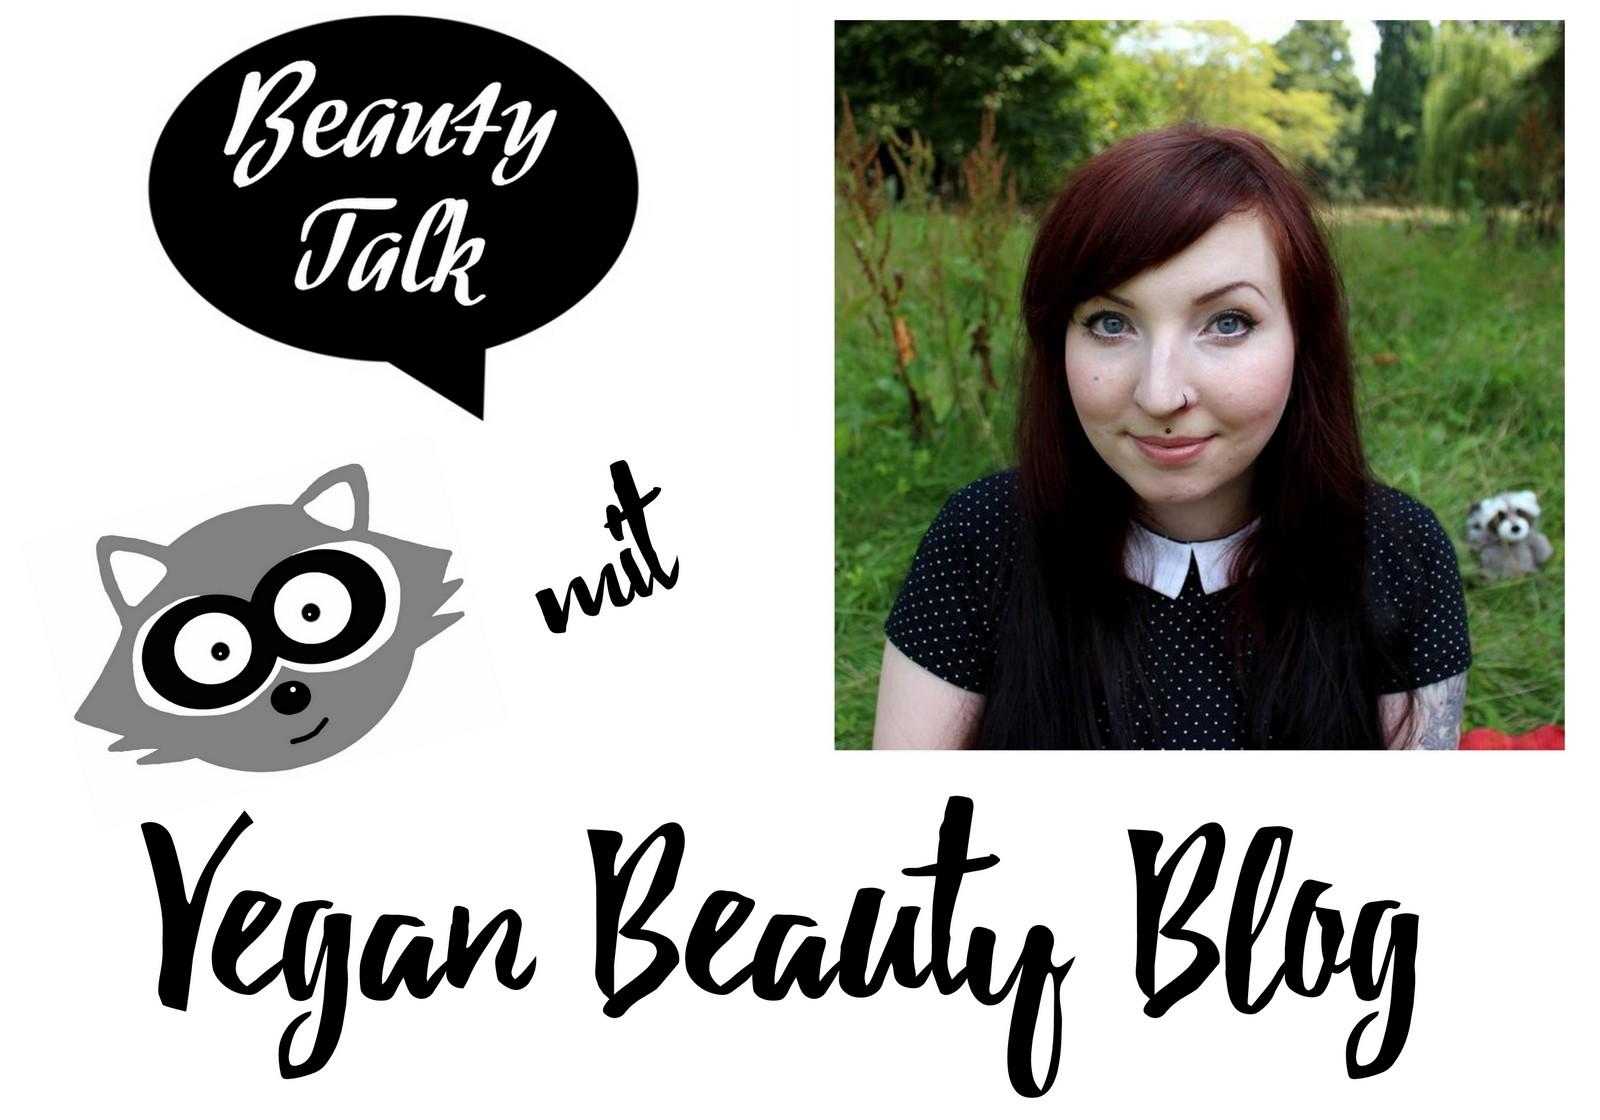 Vegan Beauty Blog im Beauty Talk Interview. Über vegane Kosmetik und tierversuchsfreie Kosmetik berichtet Beautybloggerin Erbse von kosmetik-vegan.de